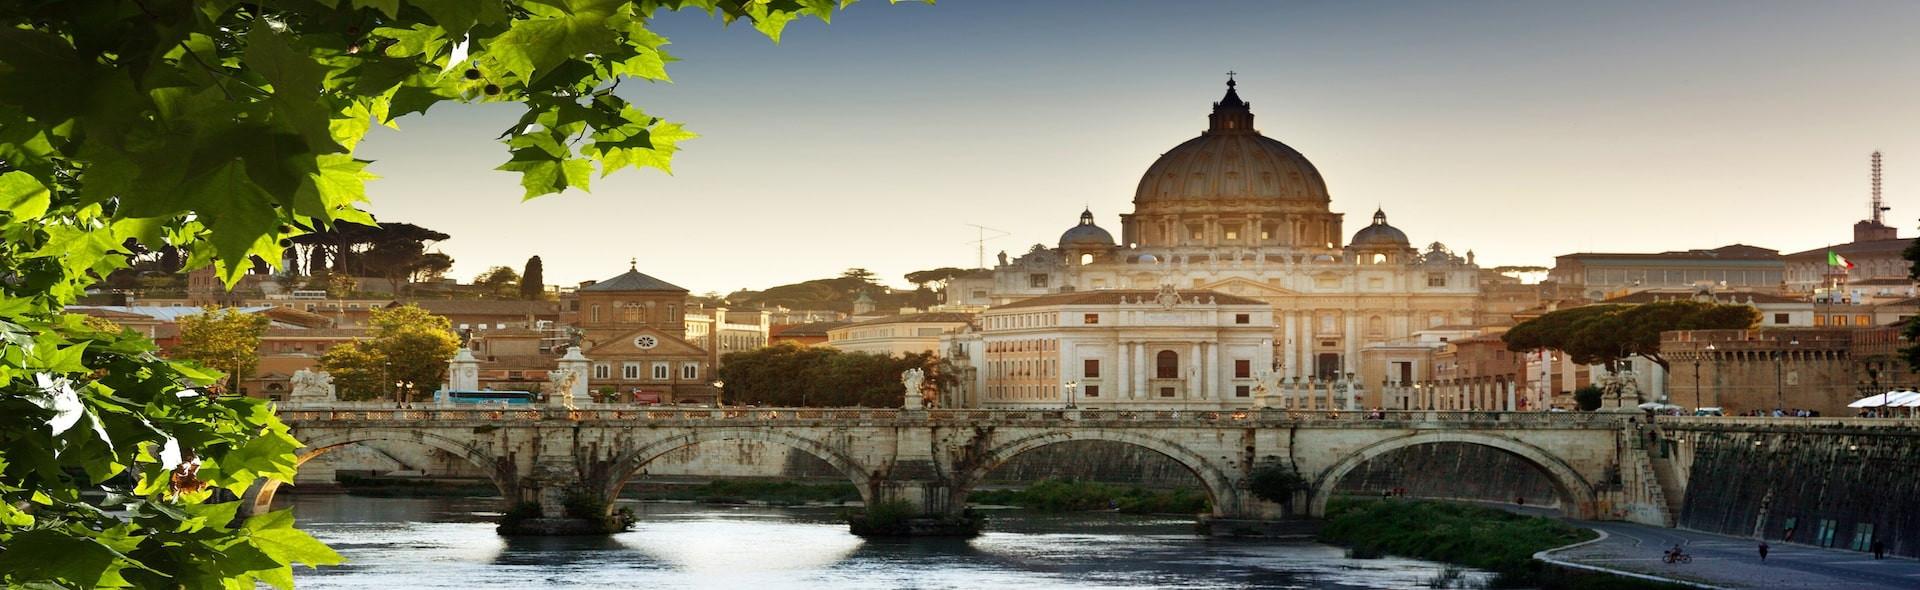 Pellegrinaggio a Roma Week End Ottobre